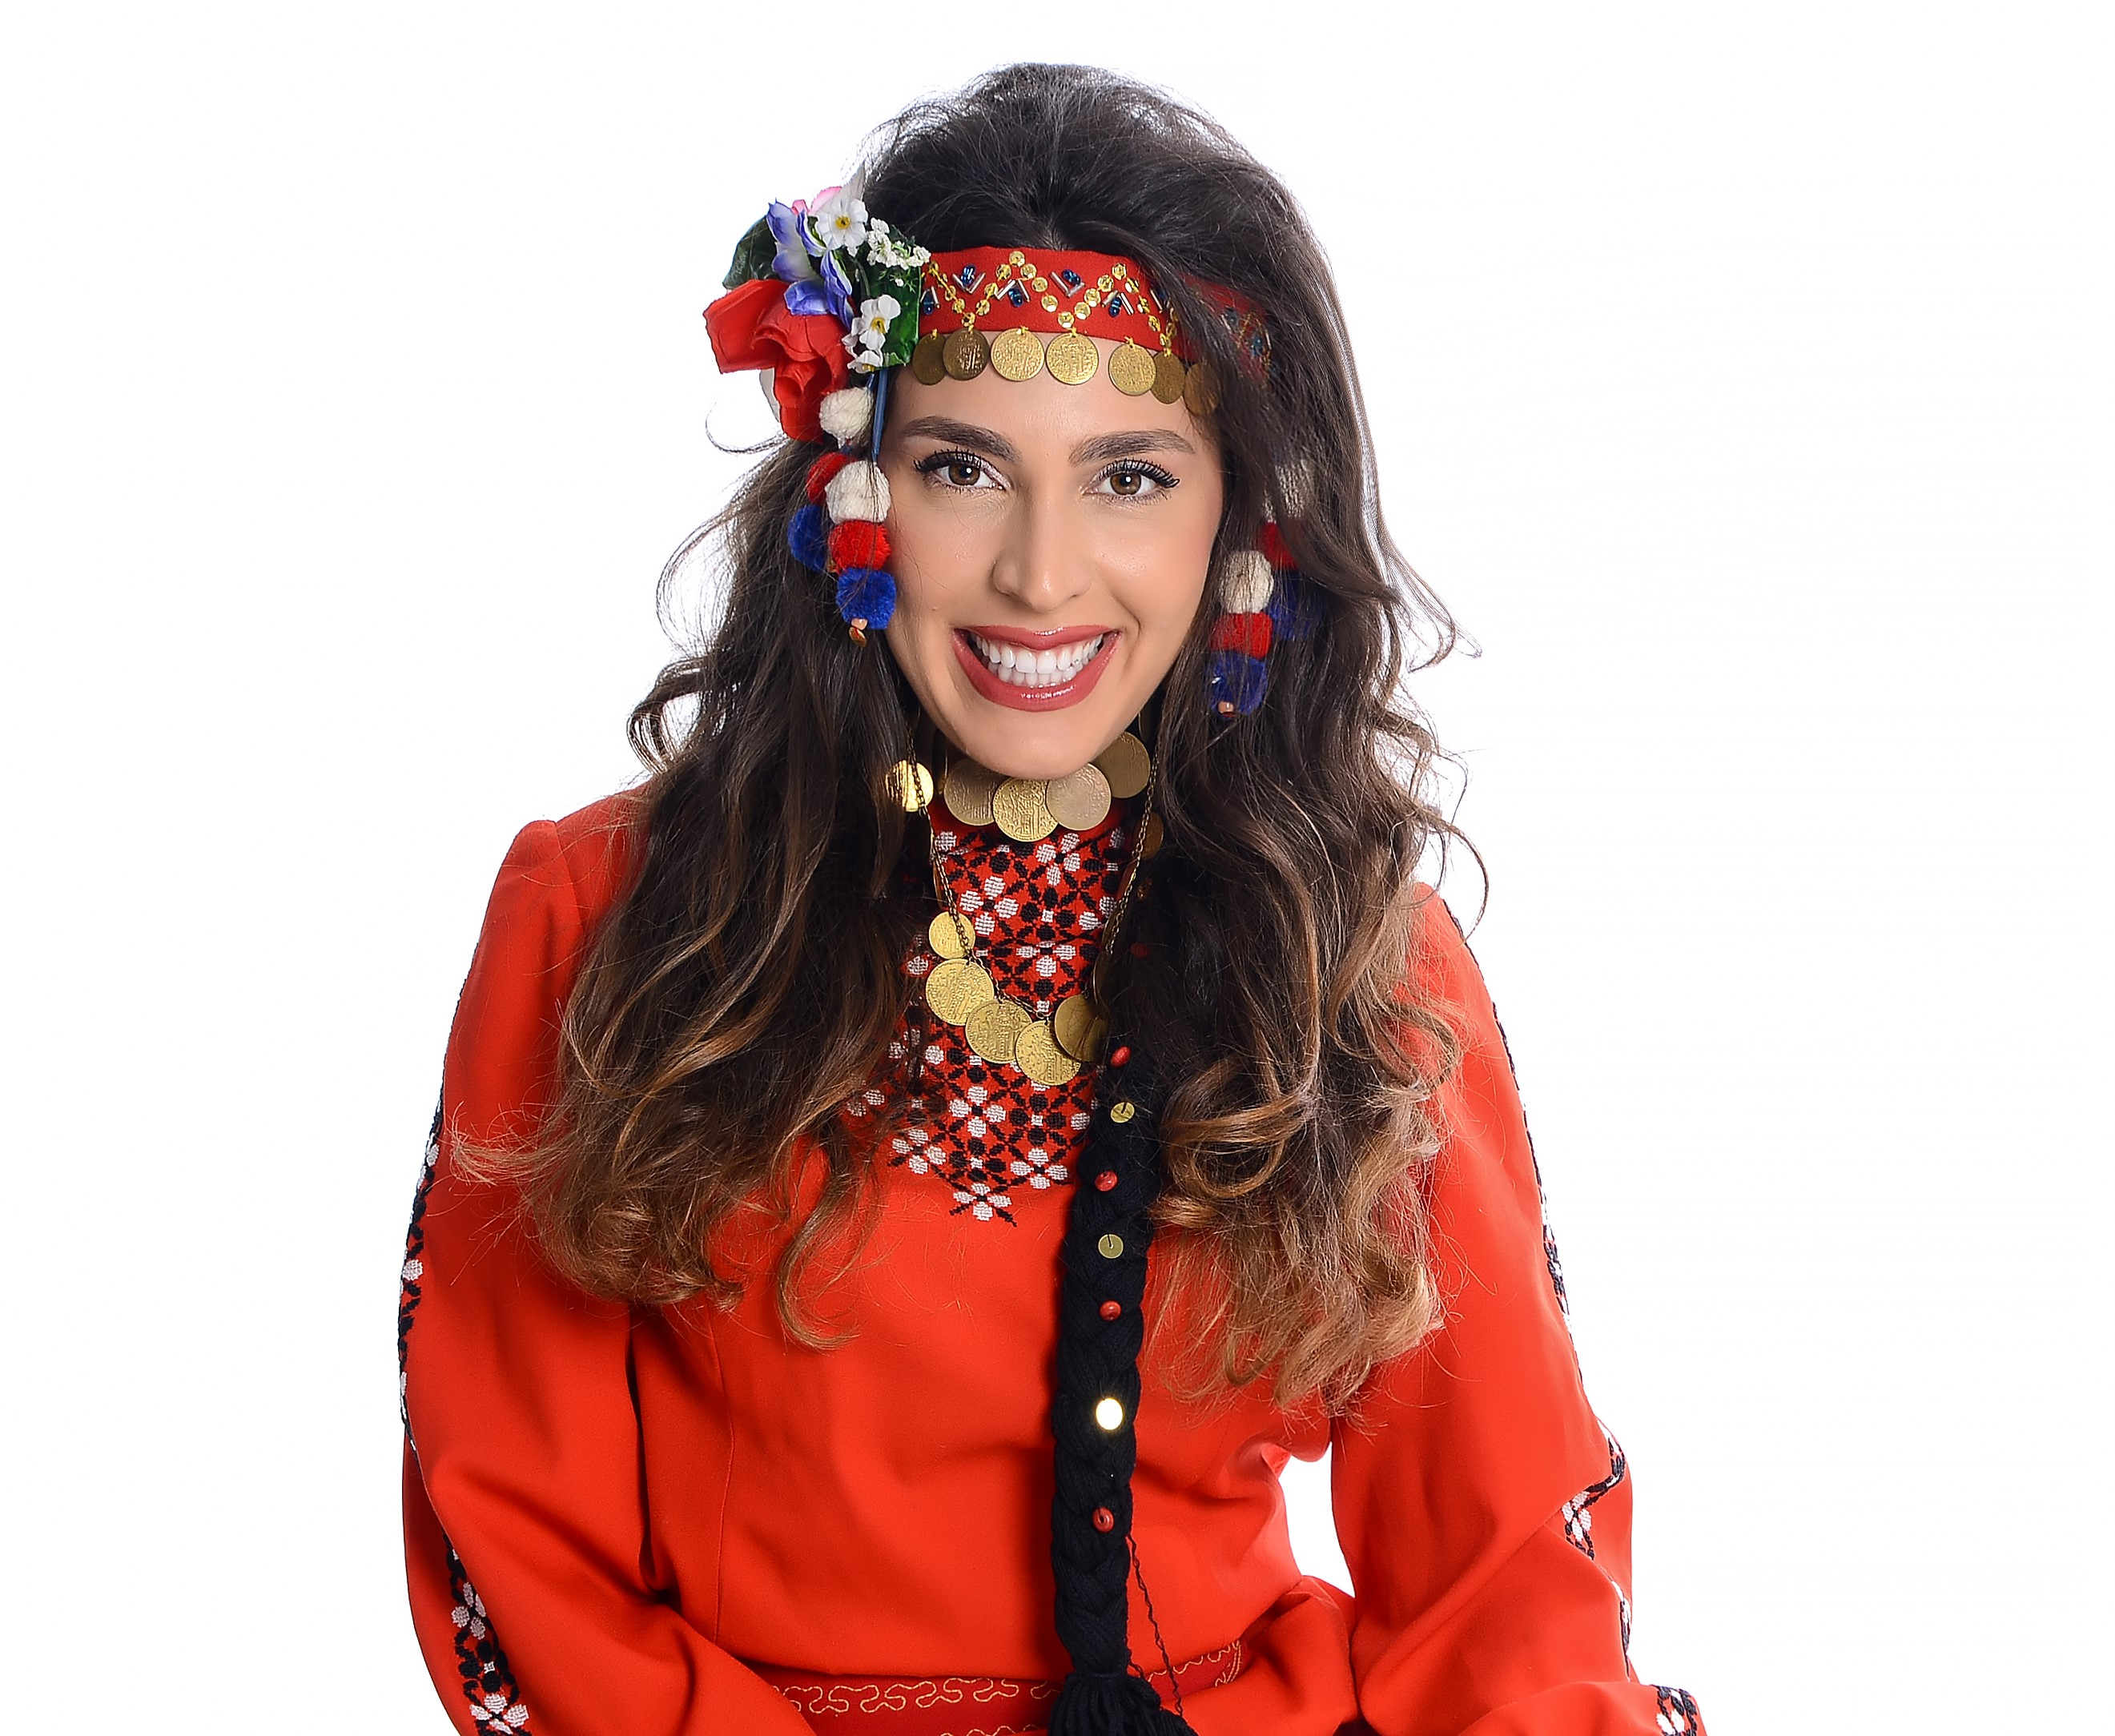 Denia-Pencheva